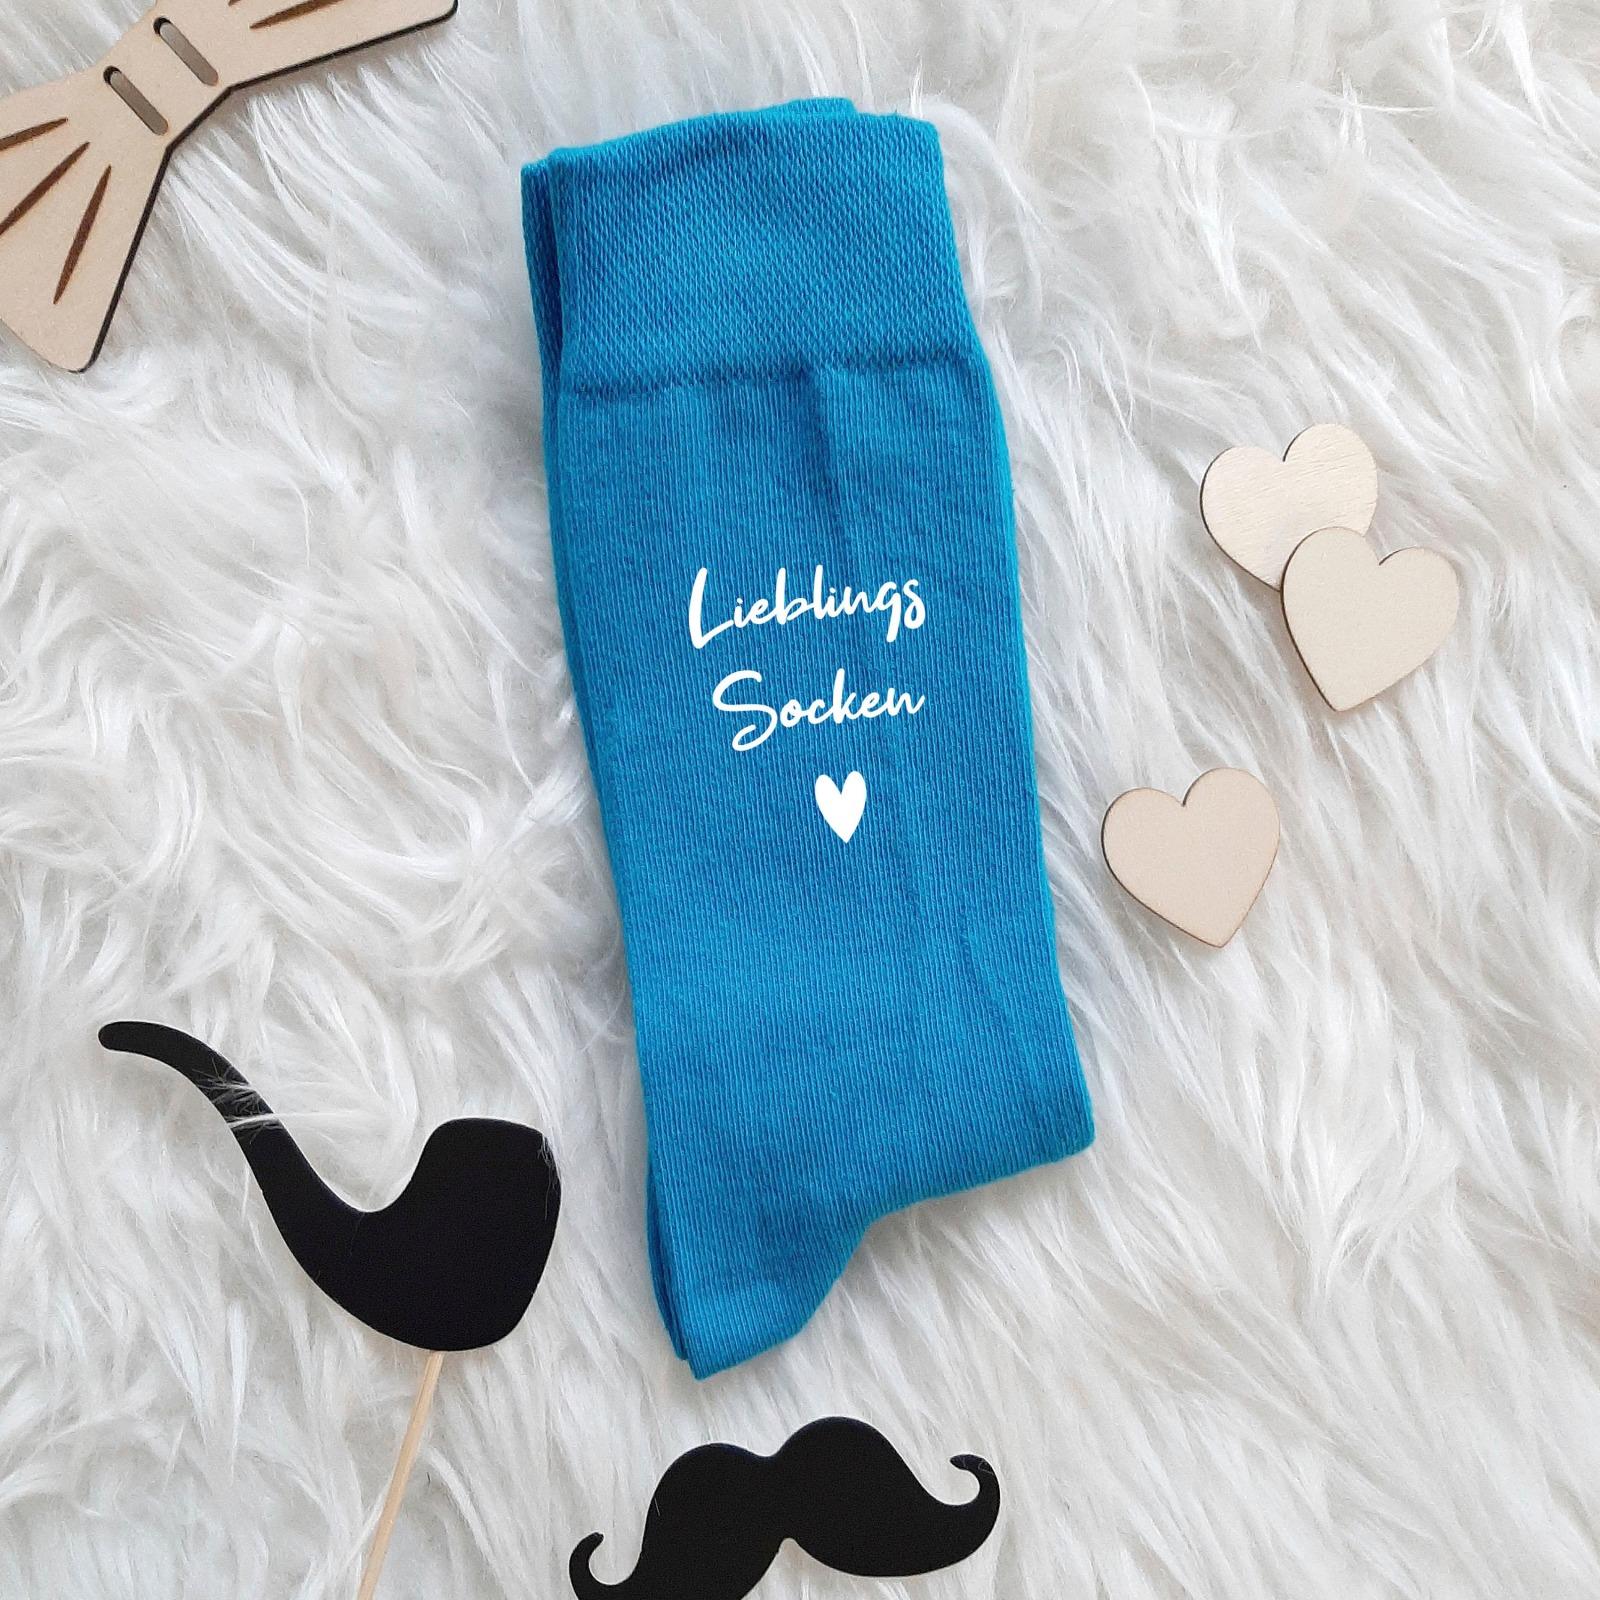 Fun Socken-Bunt | Spruch Socken |